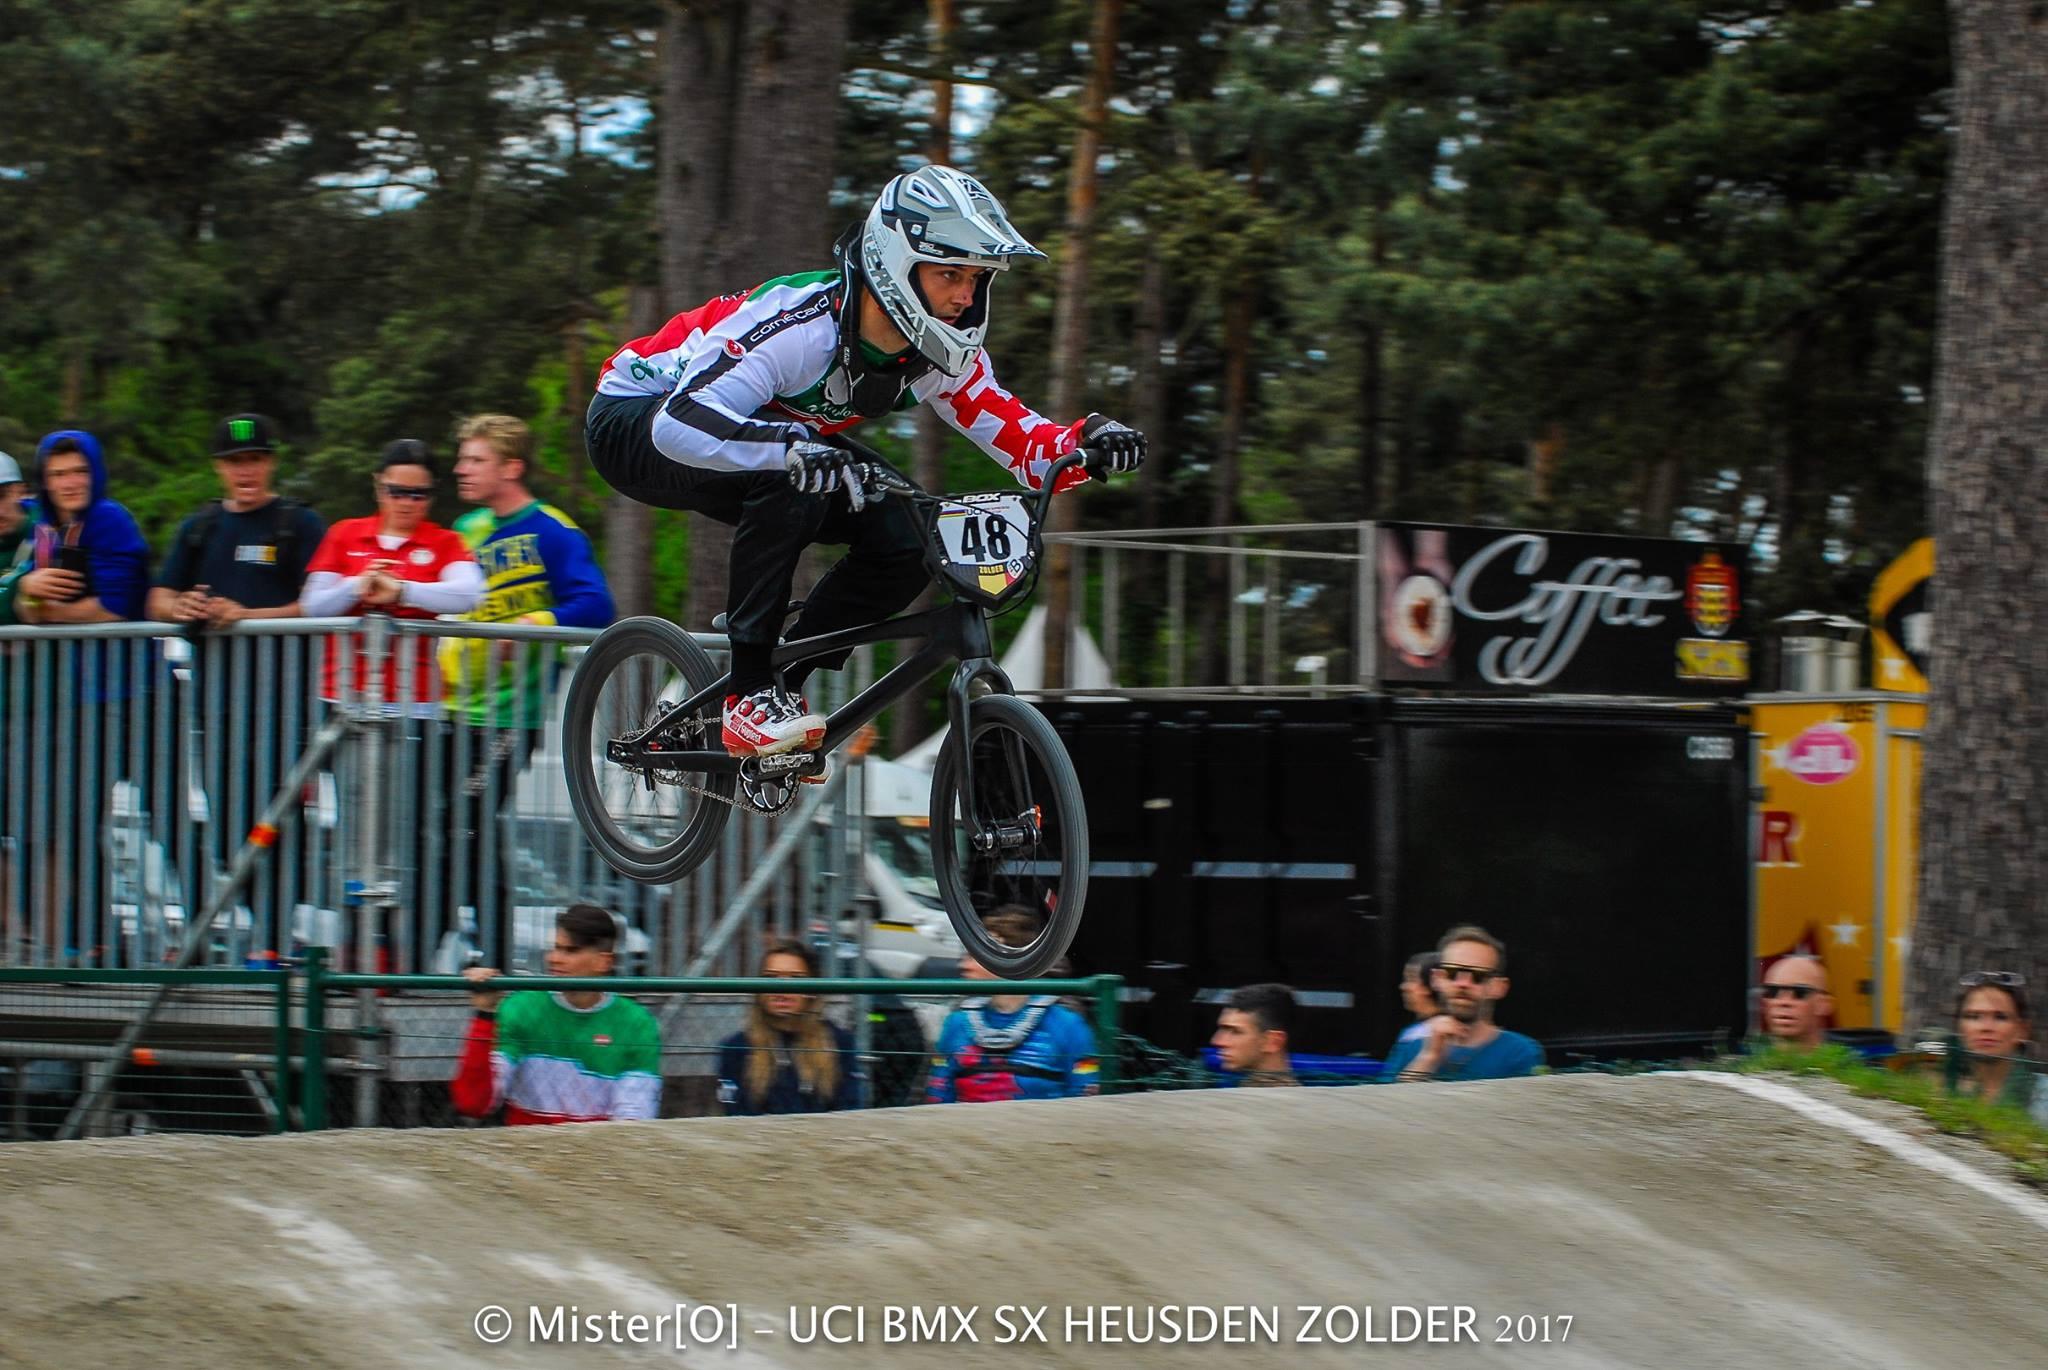 David Graf Zolder 2017 UCI WC - Richard Schols - Mister O